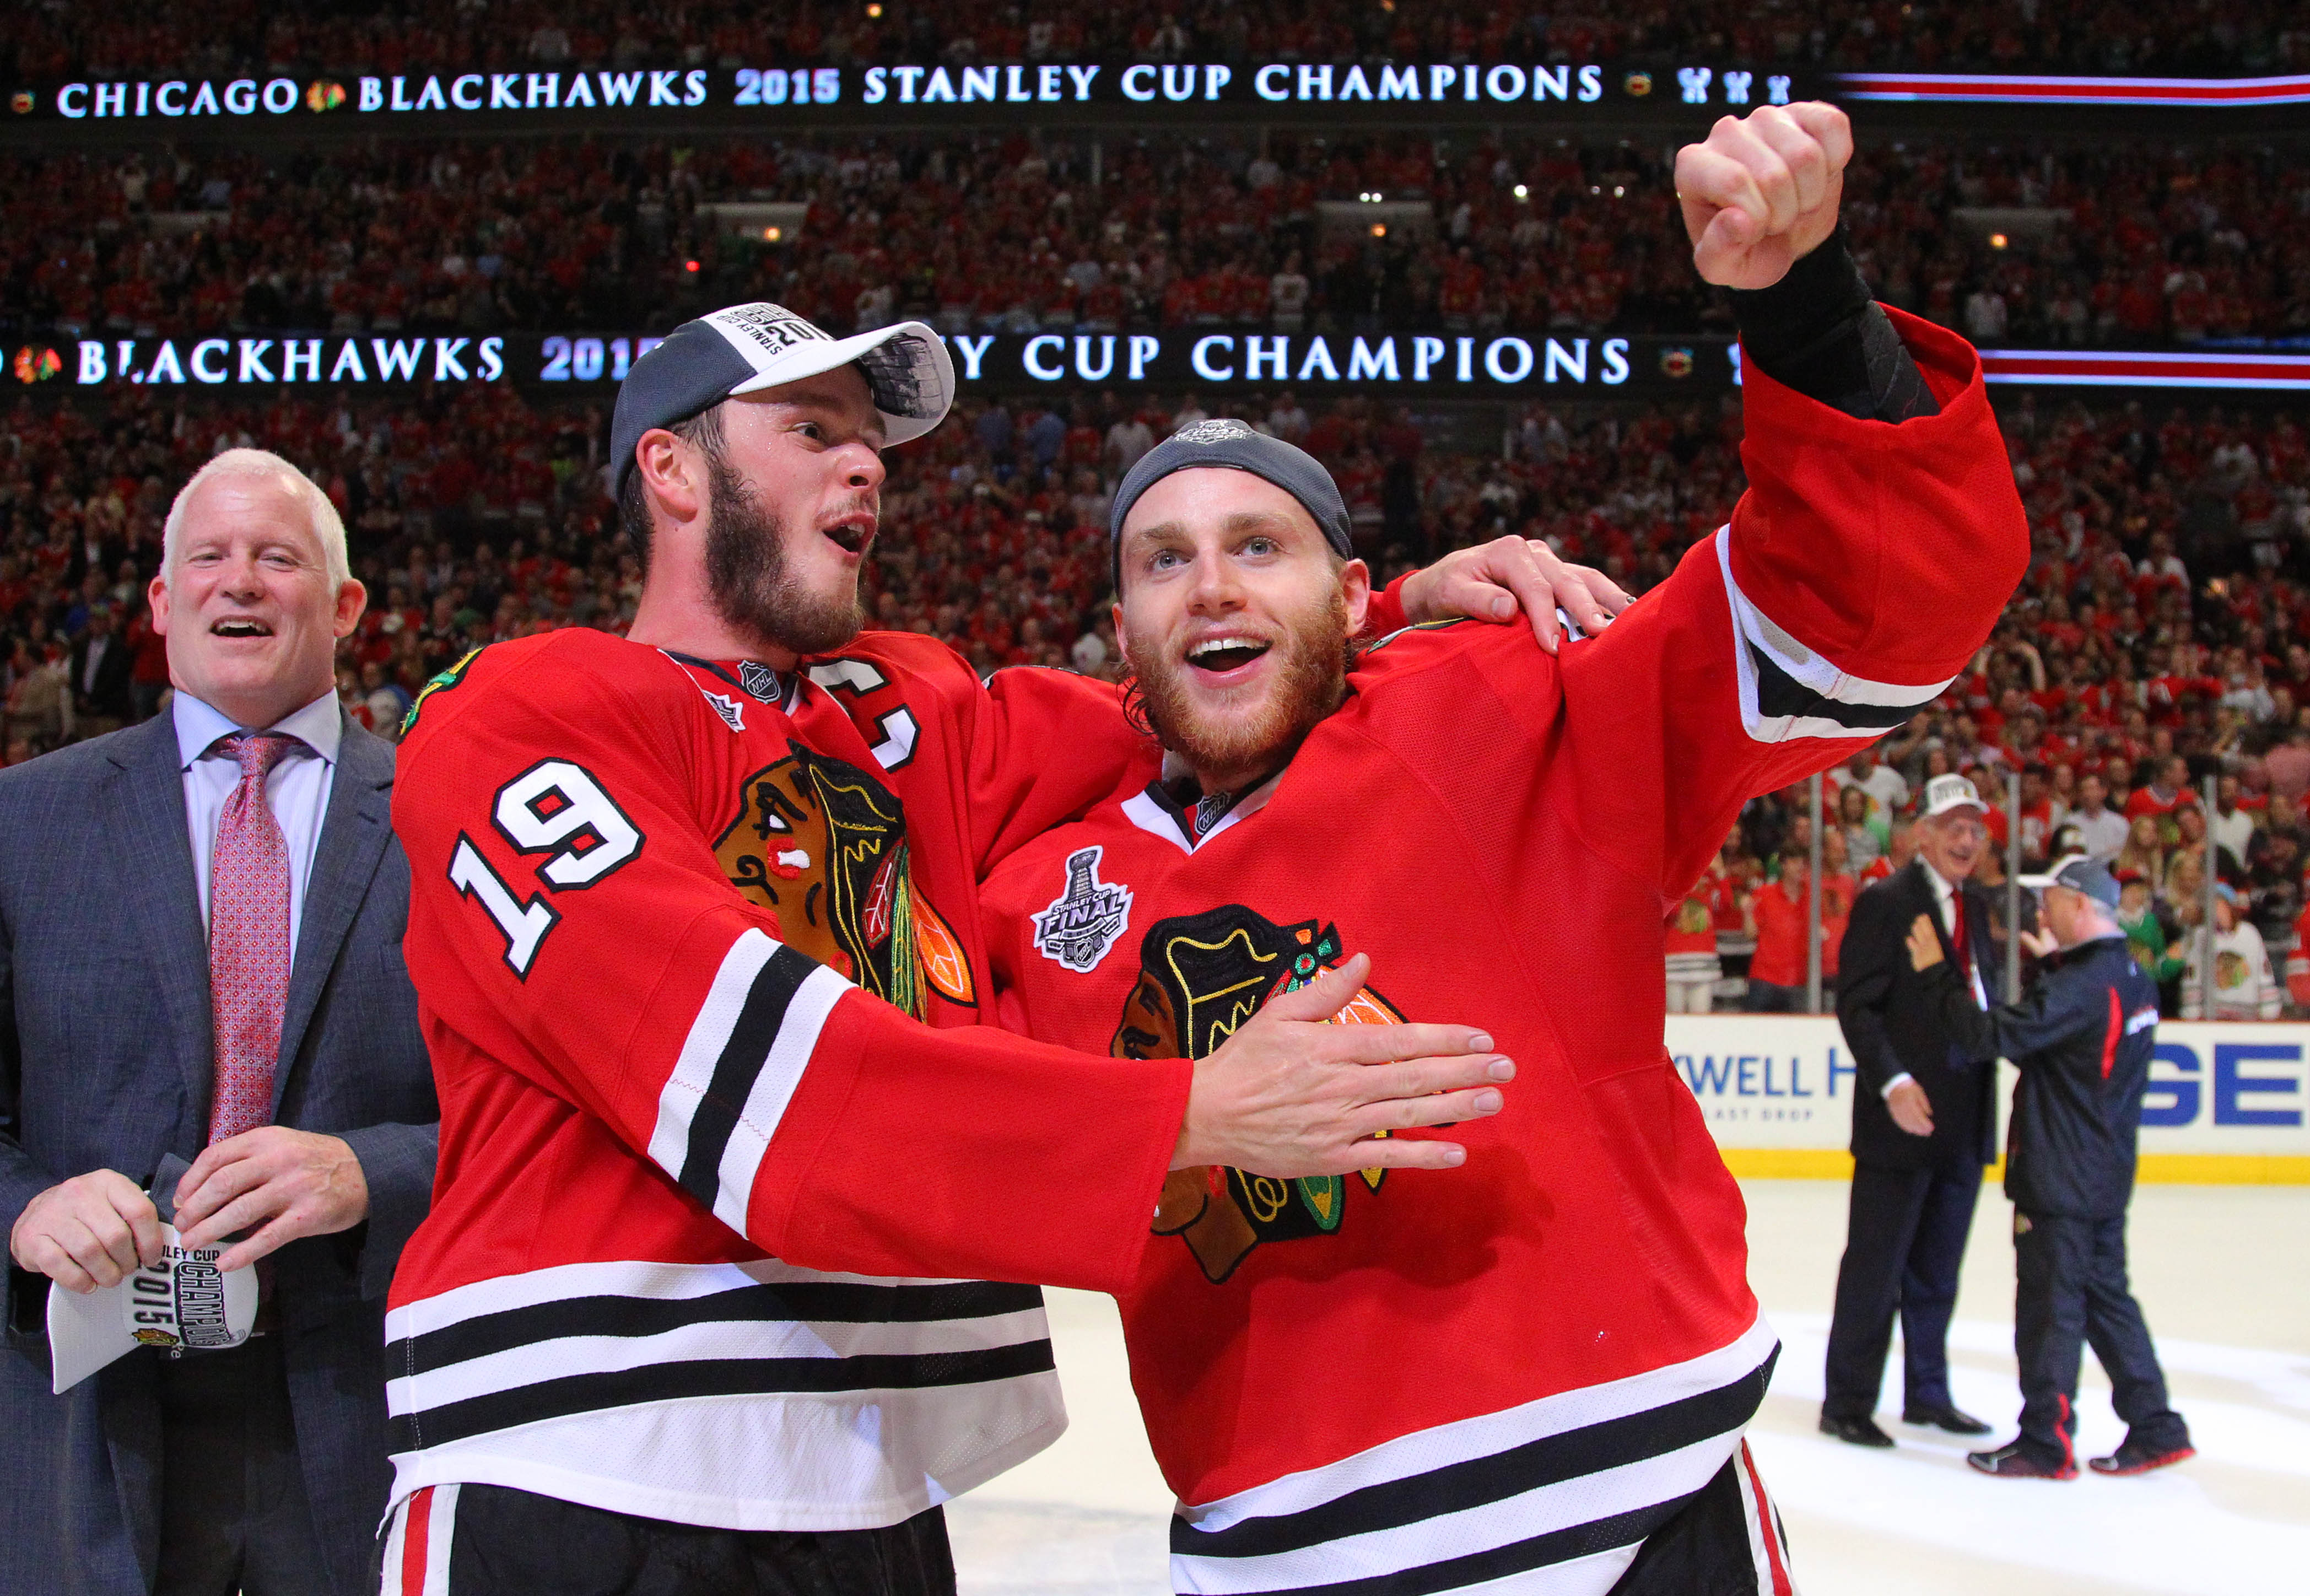 8631290-nhl-stanley-cup-final-tampa-bay-lightning-at-chicago-blackhawks